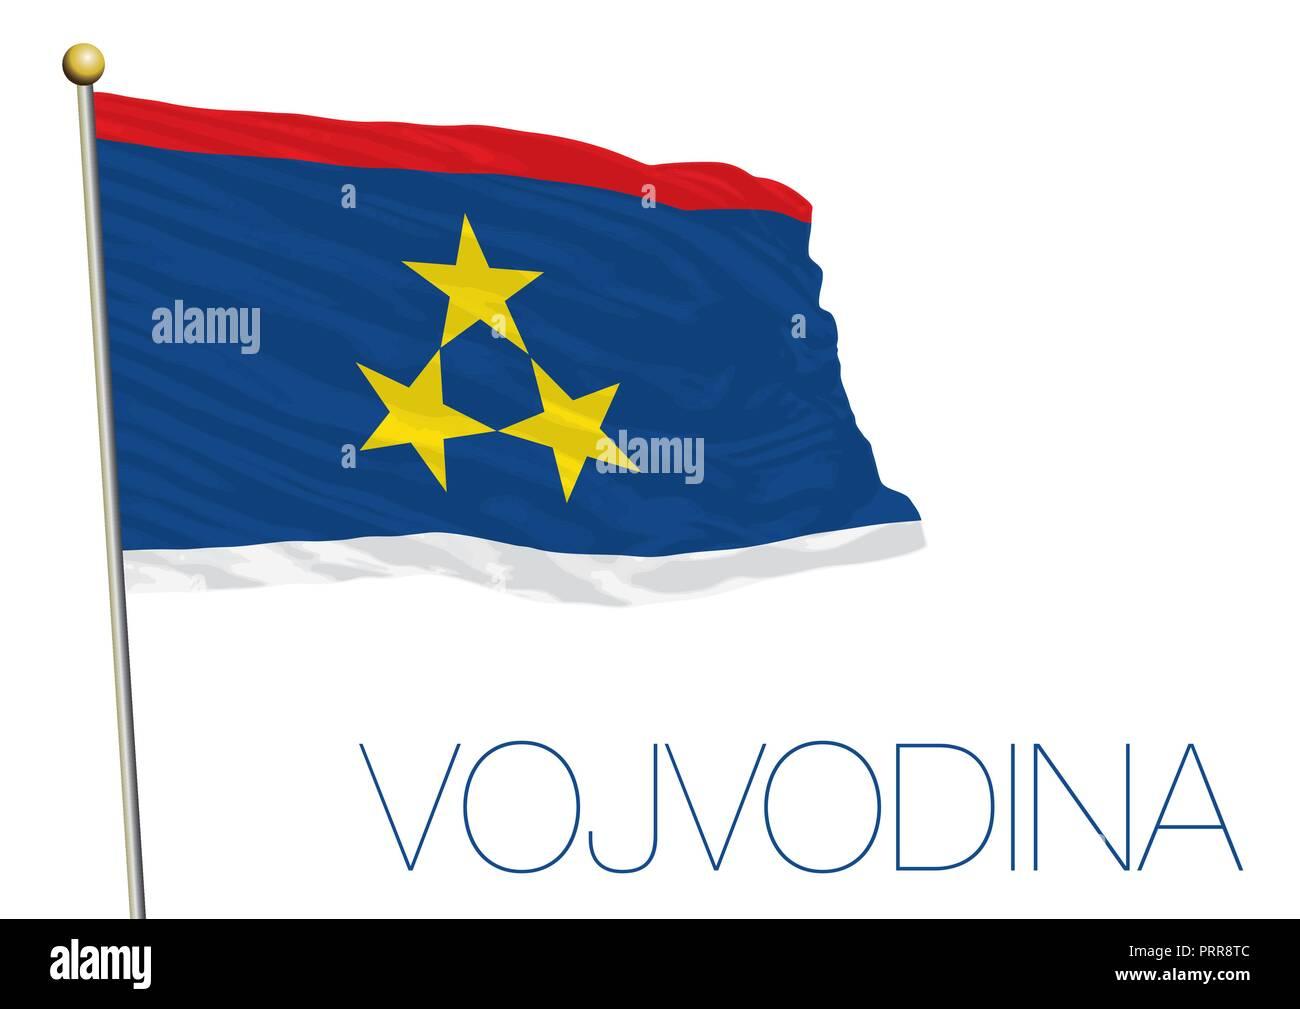 Vojvodina official flag, vector illustration - Stock Image